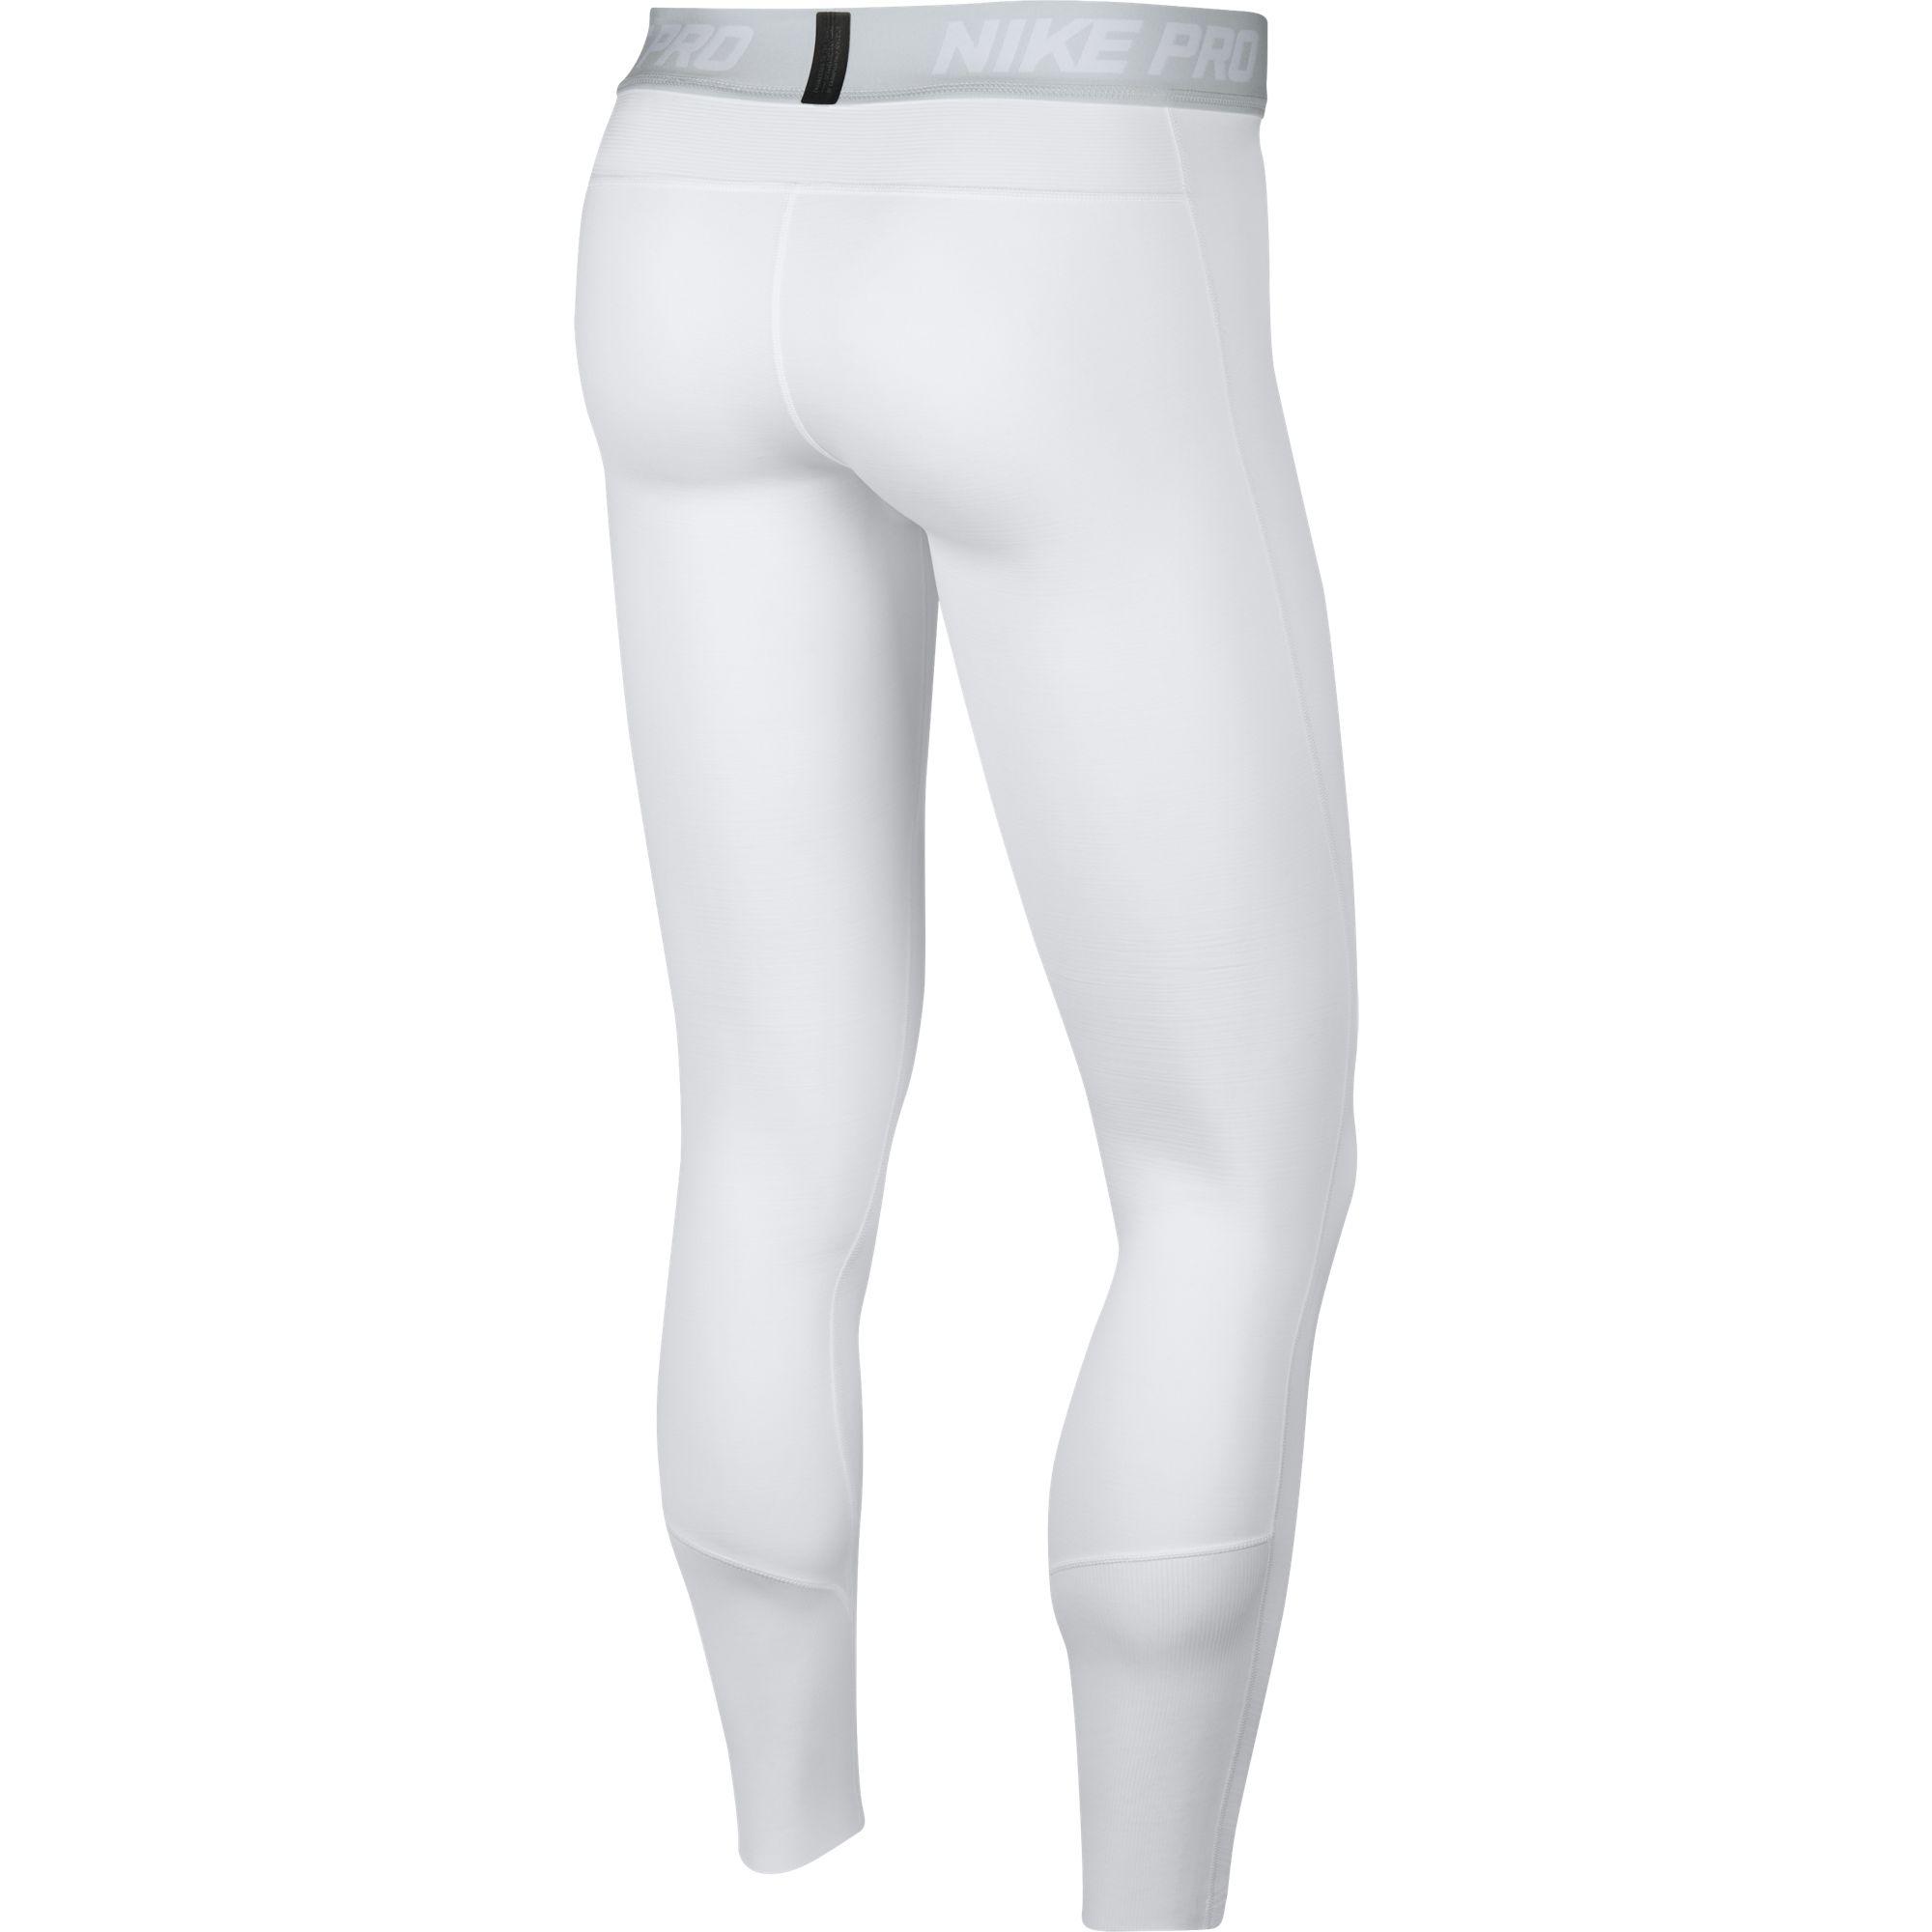 Men's Pro Dri-FIT Therma Tight, White, swatch